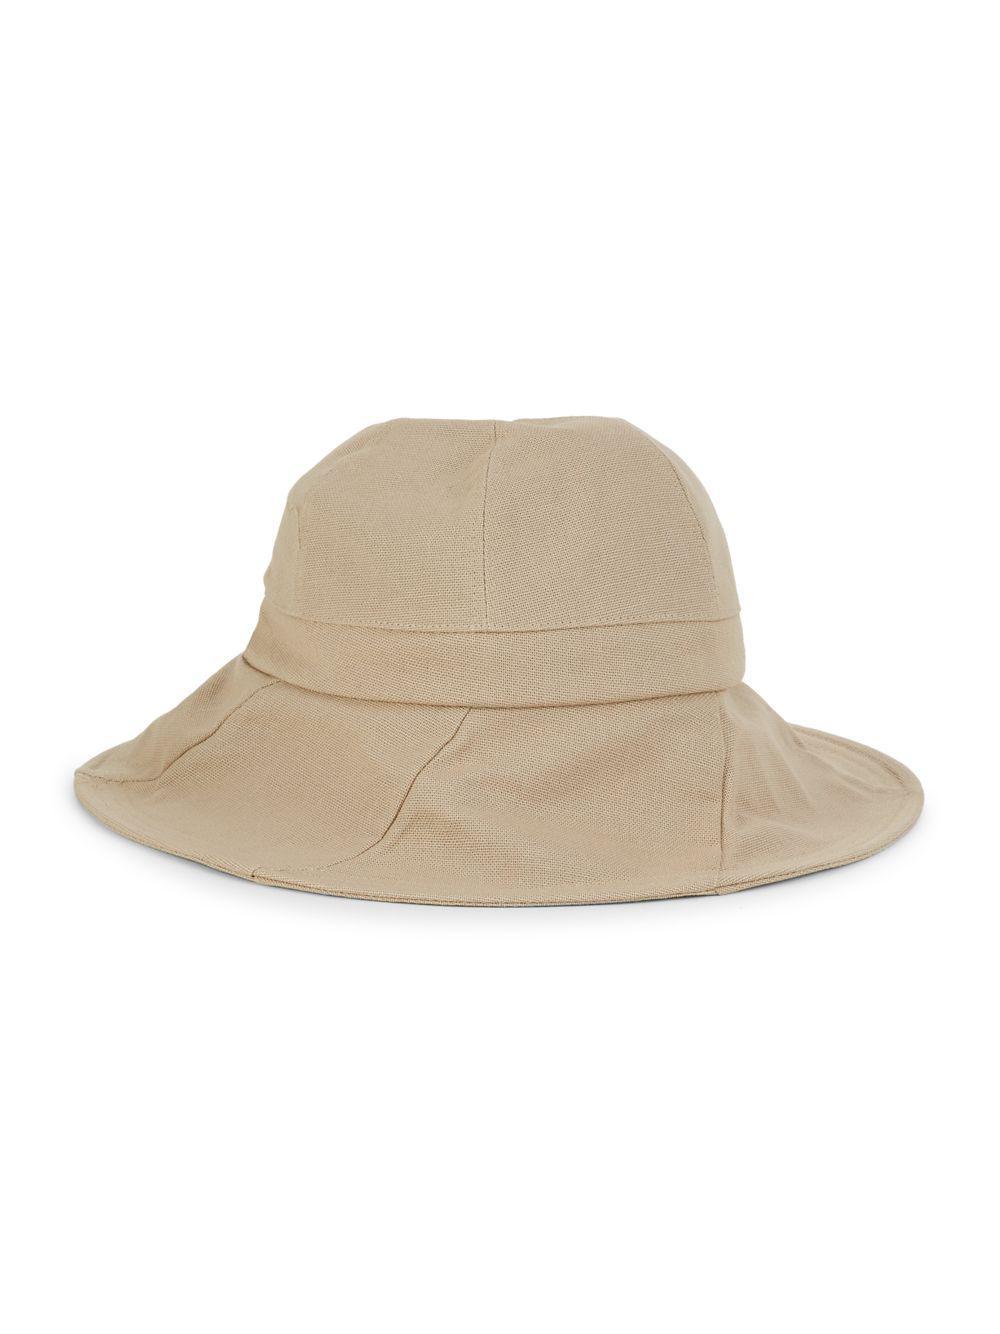 7f44a5ff9 Lyst - Dorfman Pacific Women's Cotton Sun Hat in Natural